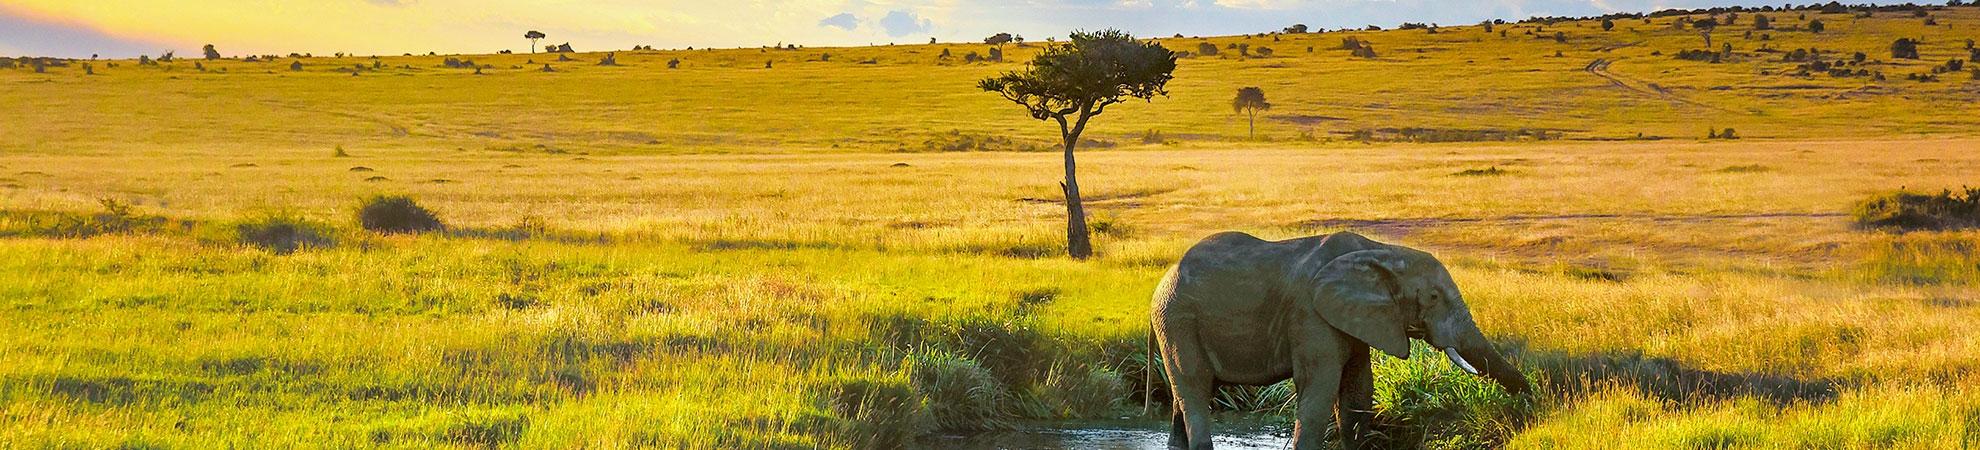 Voyage Masai Mara National Reserve